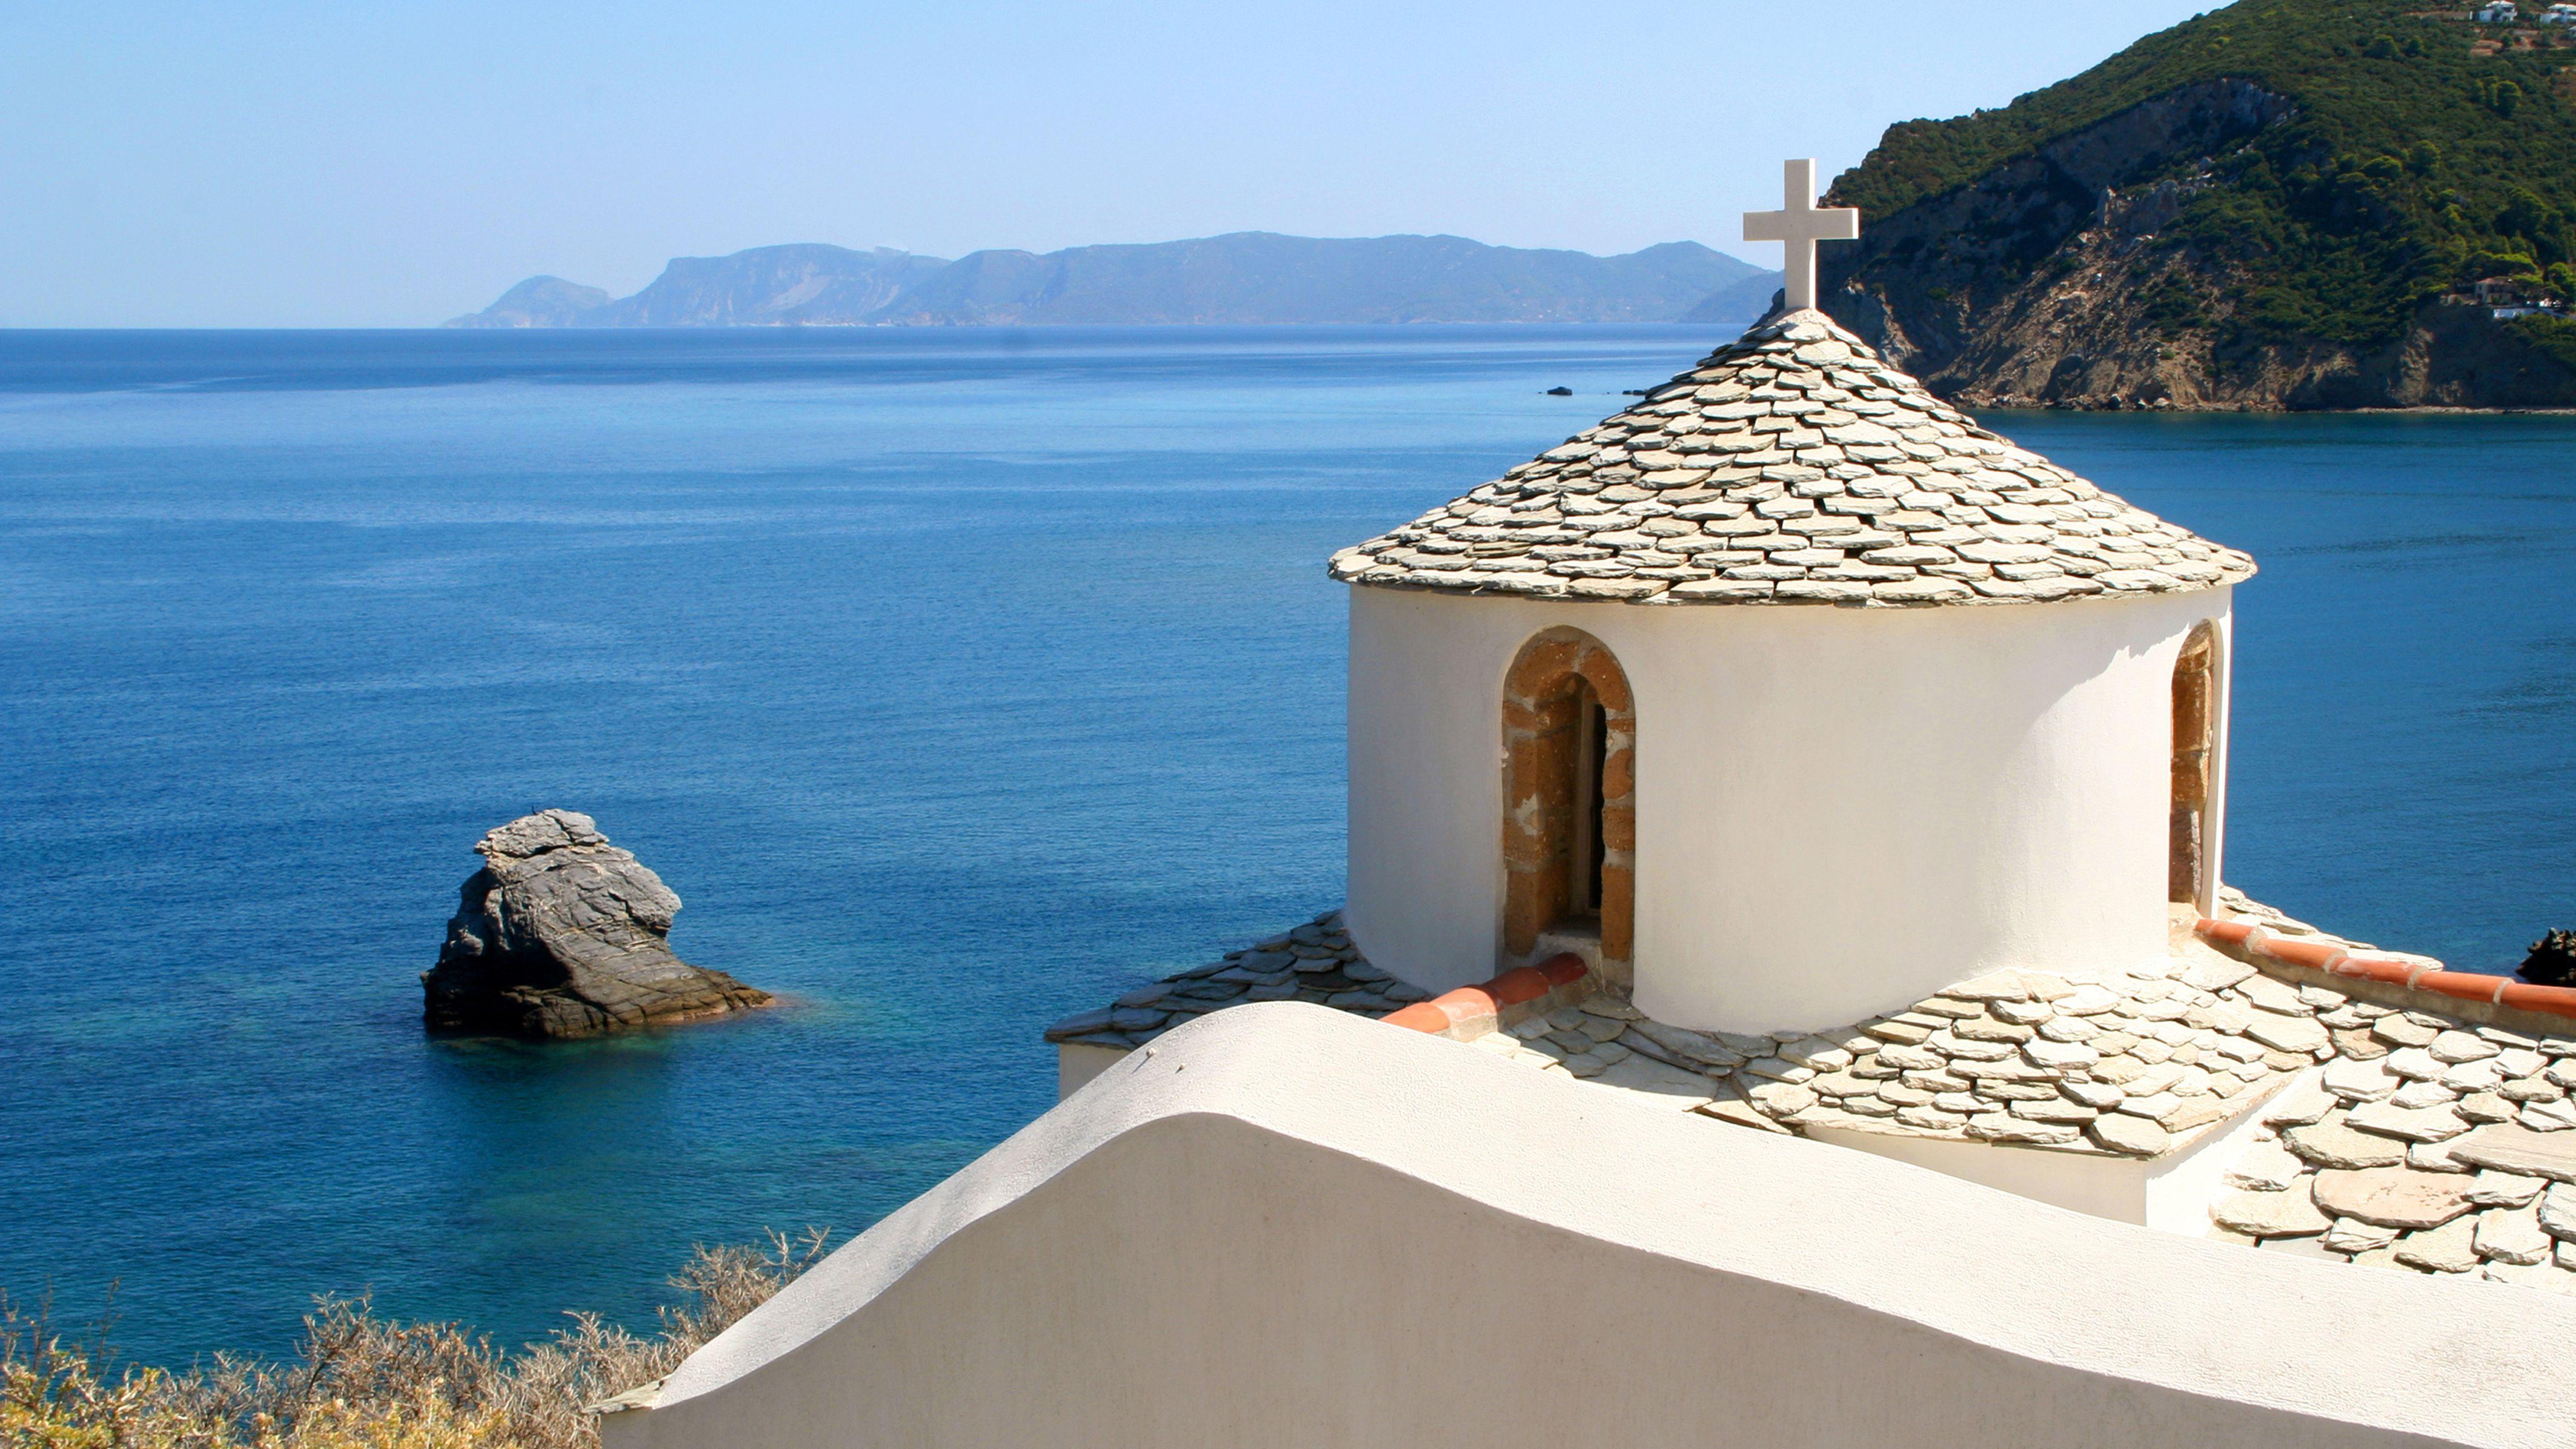 Kalokairi Skopelos The Greek Island From Mamma Mia